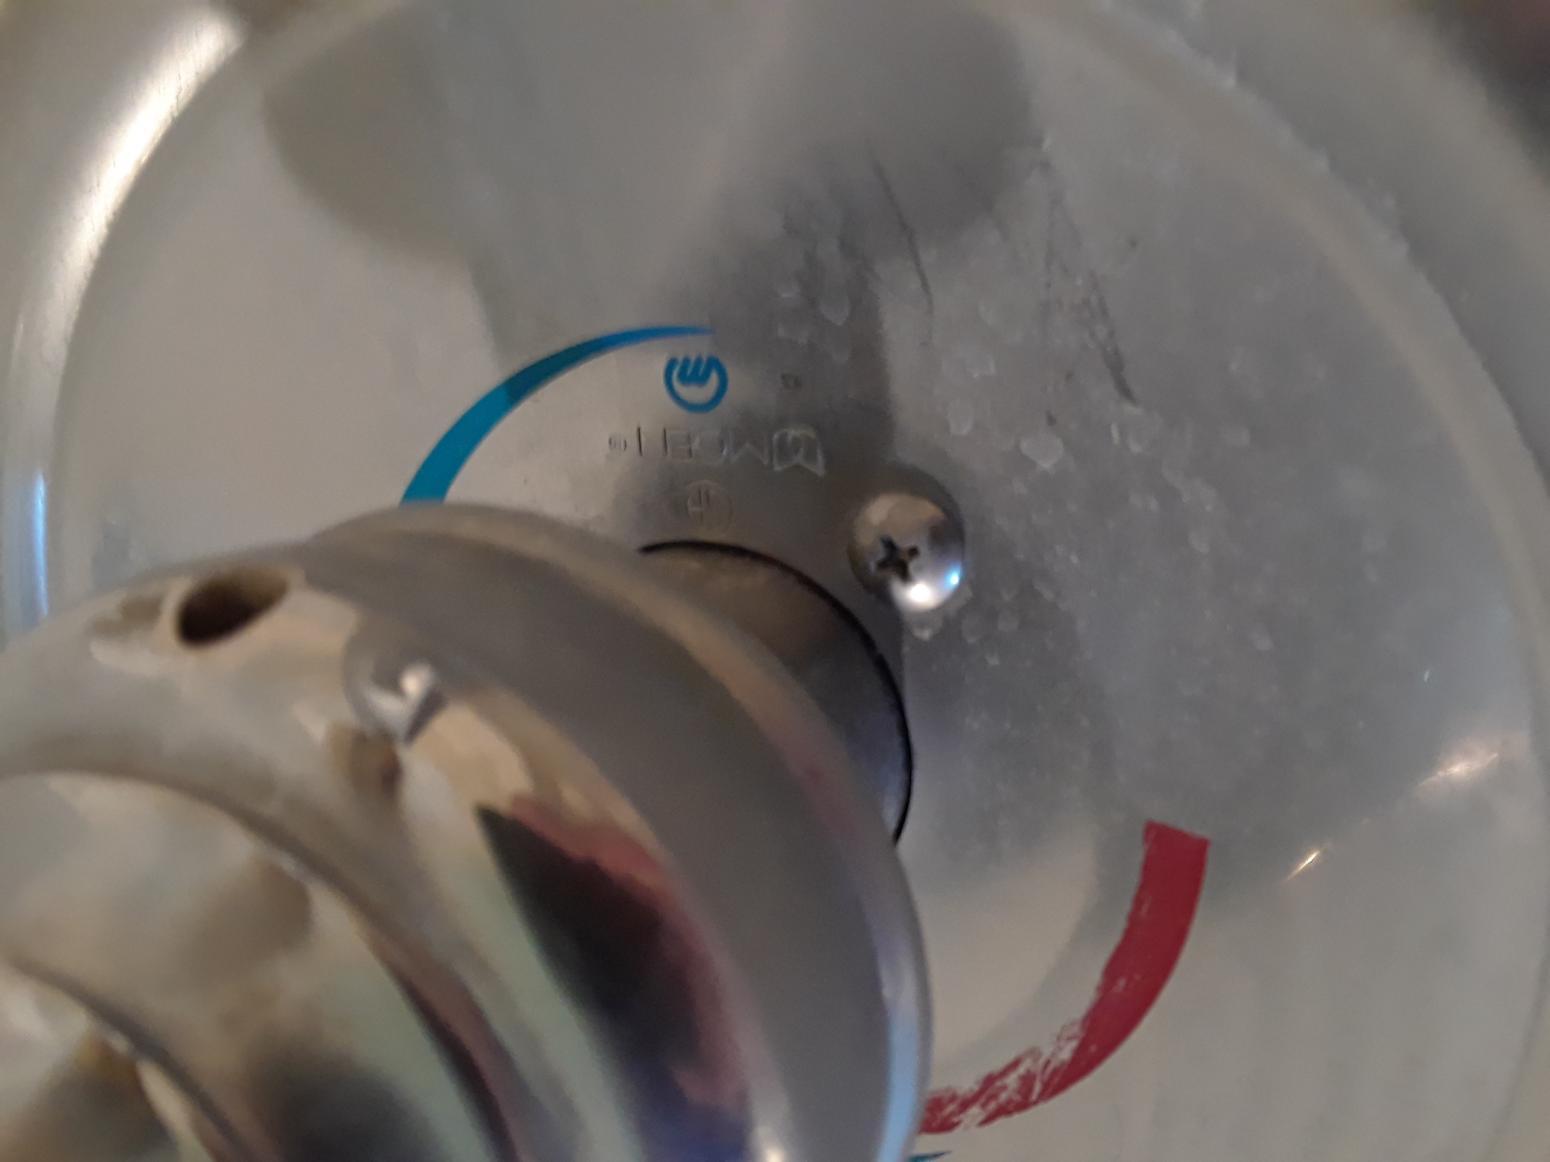 Cartridge For Single Handled Moen Bathtub Faucet Doityourself Com Community Forums